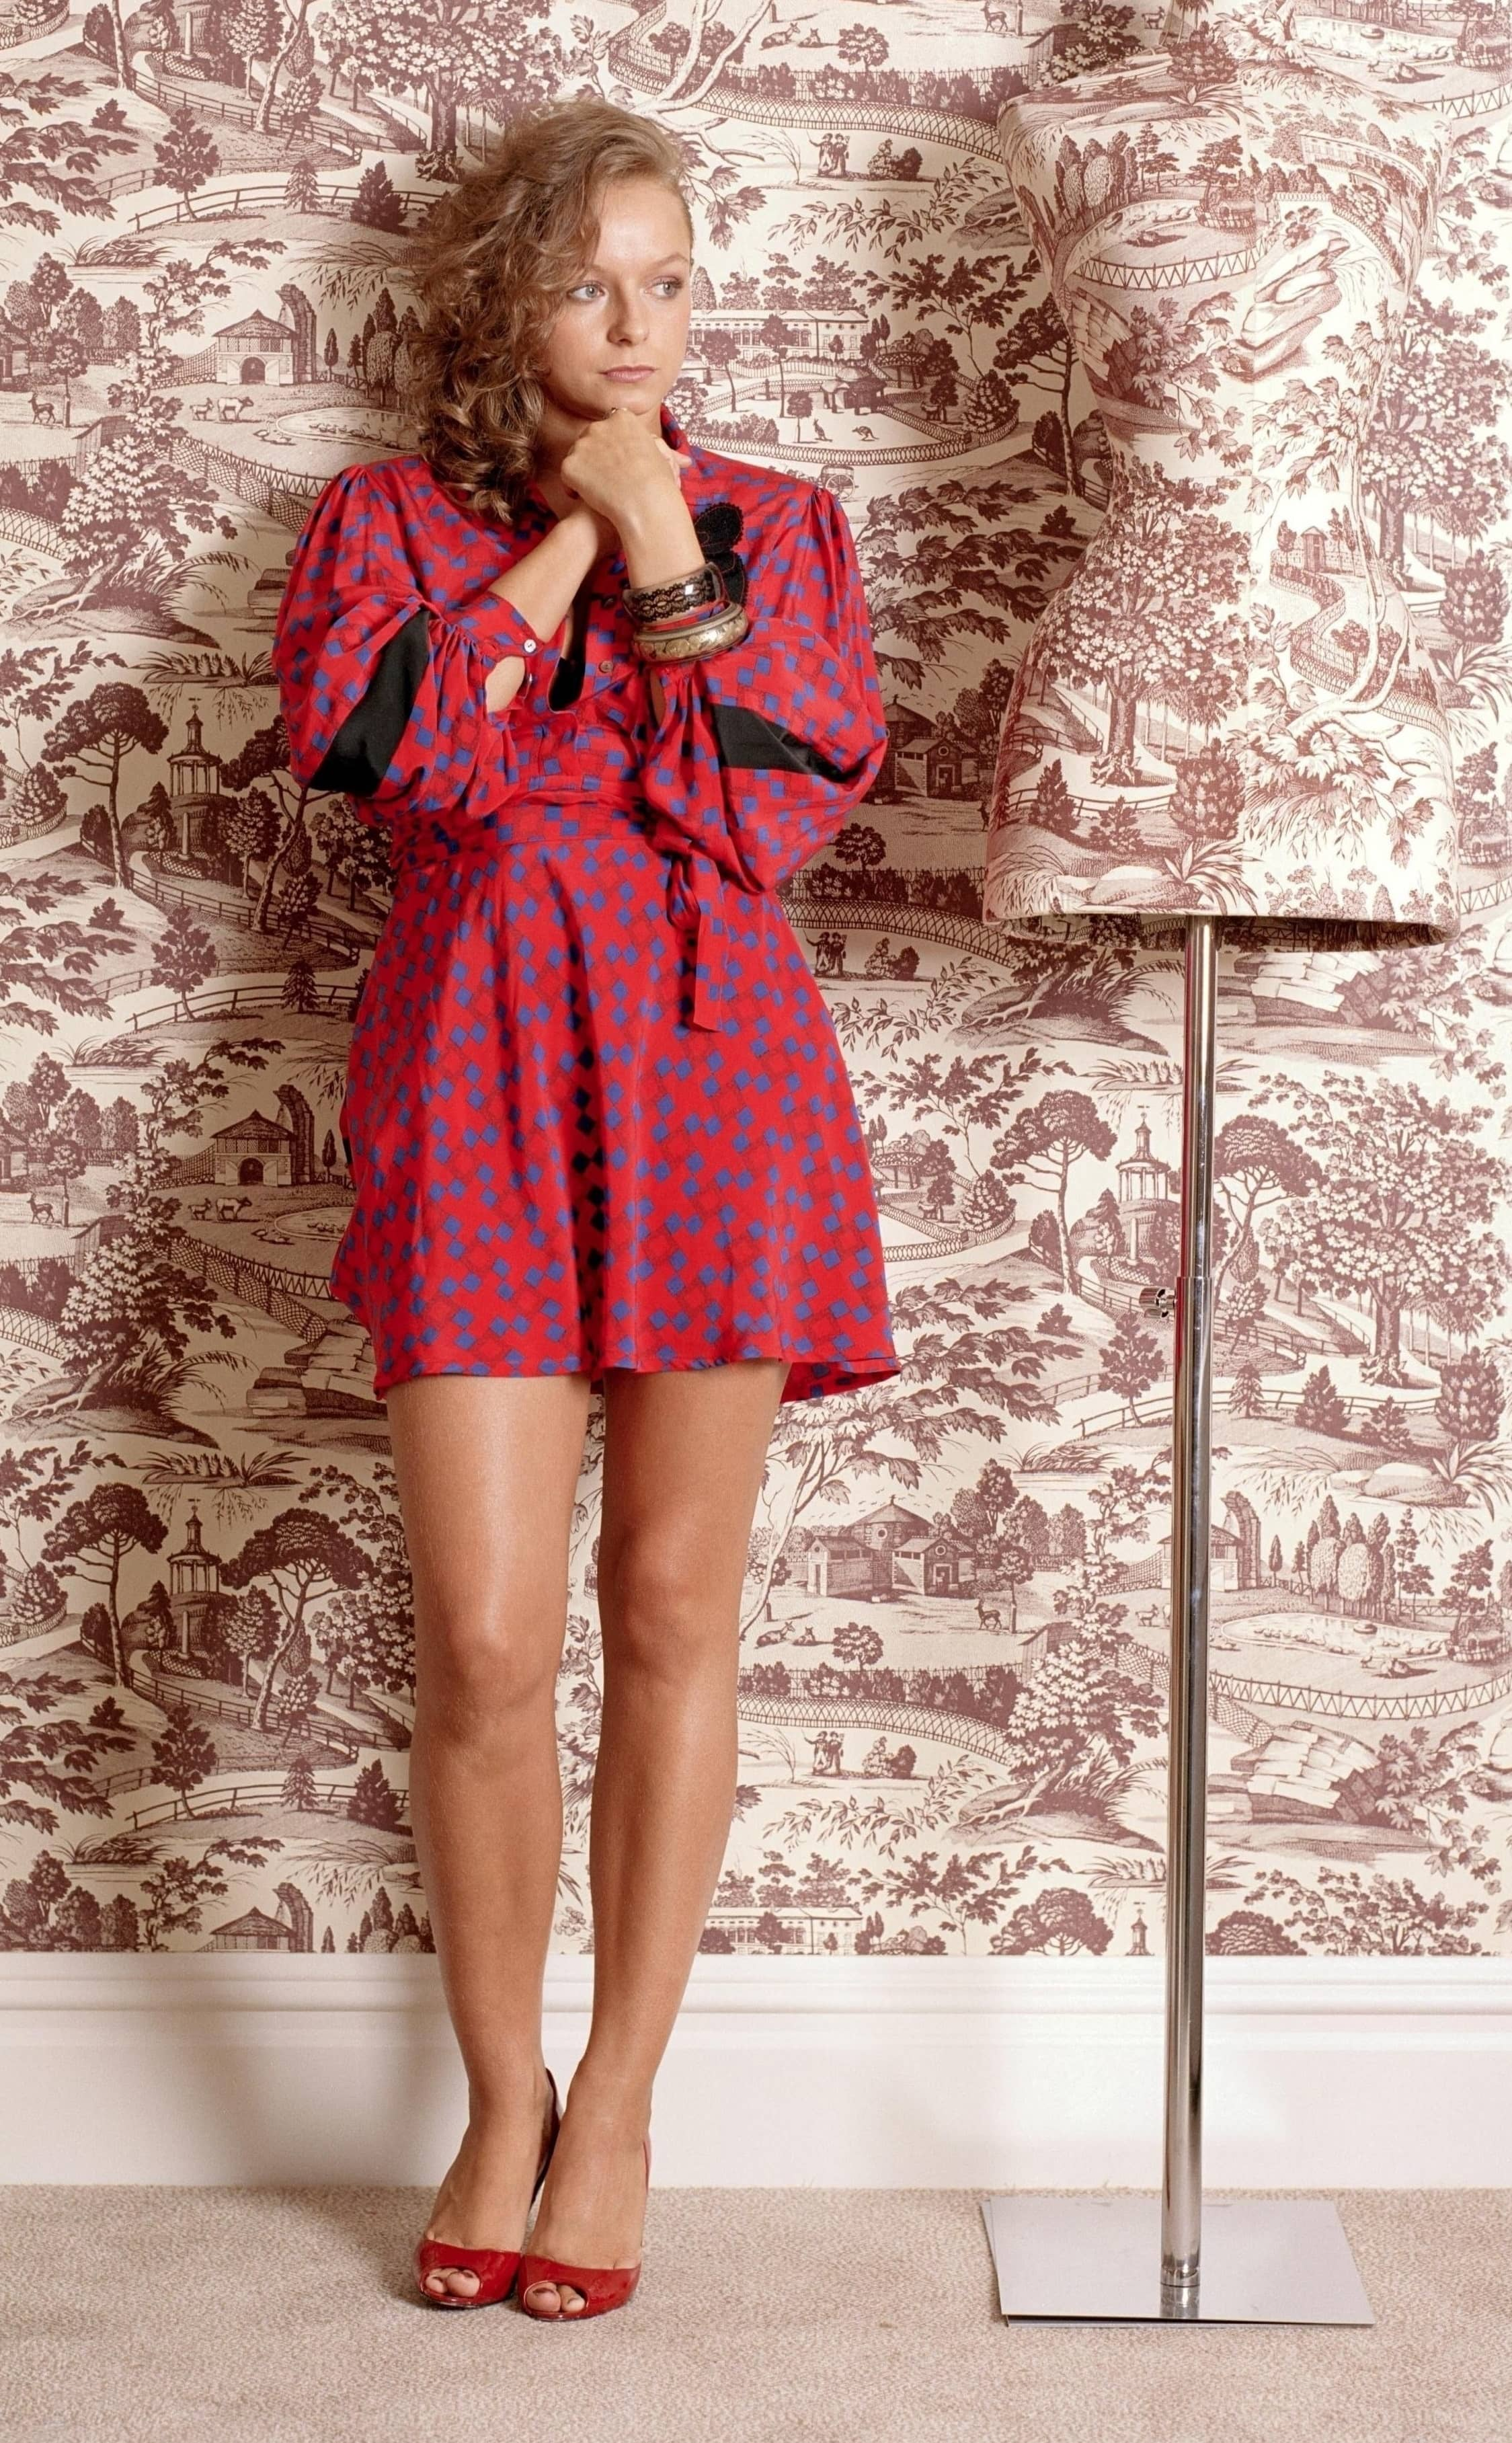 Samantha Morton Wallpapers hd